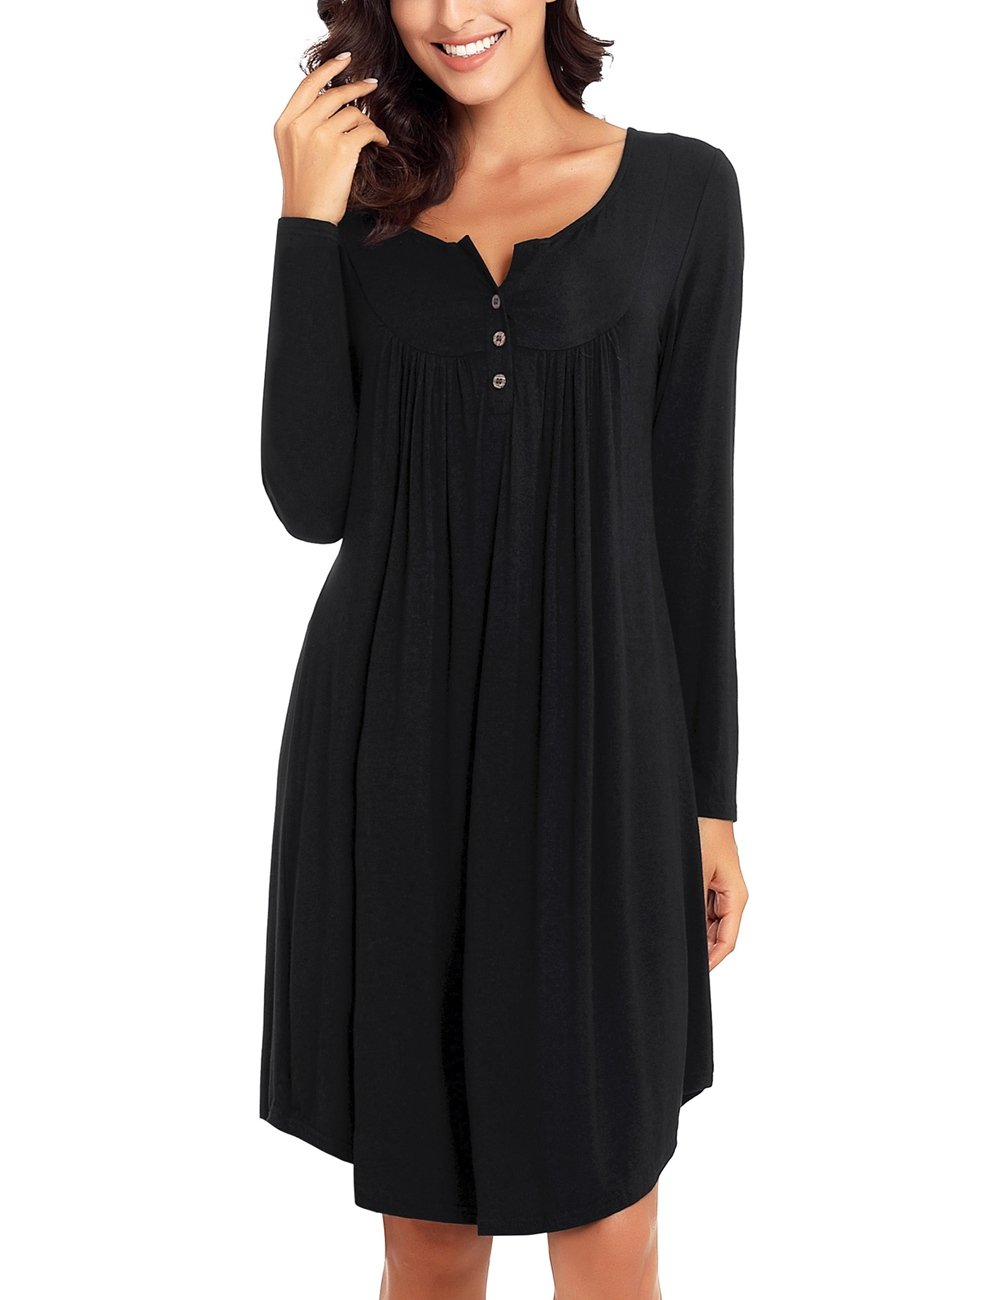 GRAPENT Women's Black Long Sleeve Henley Shirt Dress Buttons Casual Loose Tunic Pleated Dress XL(US 16-18)